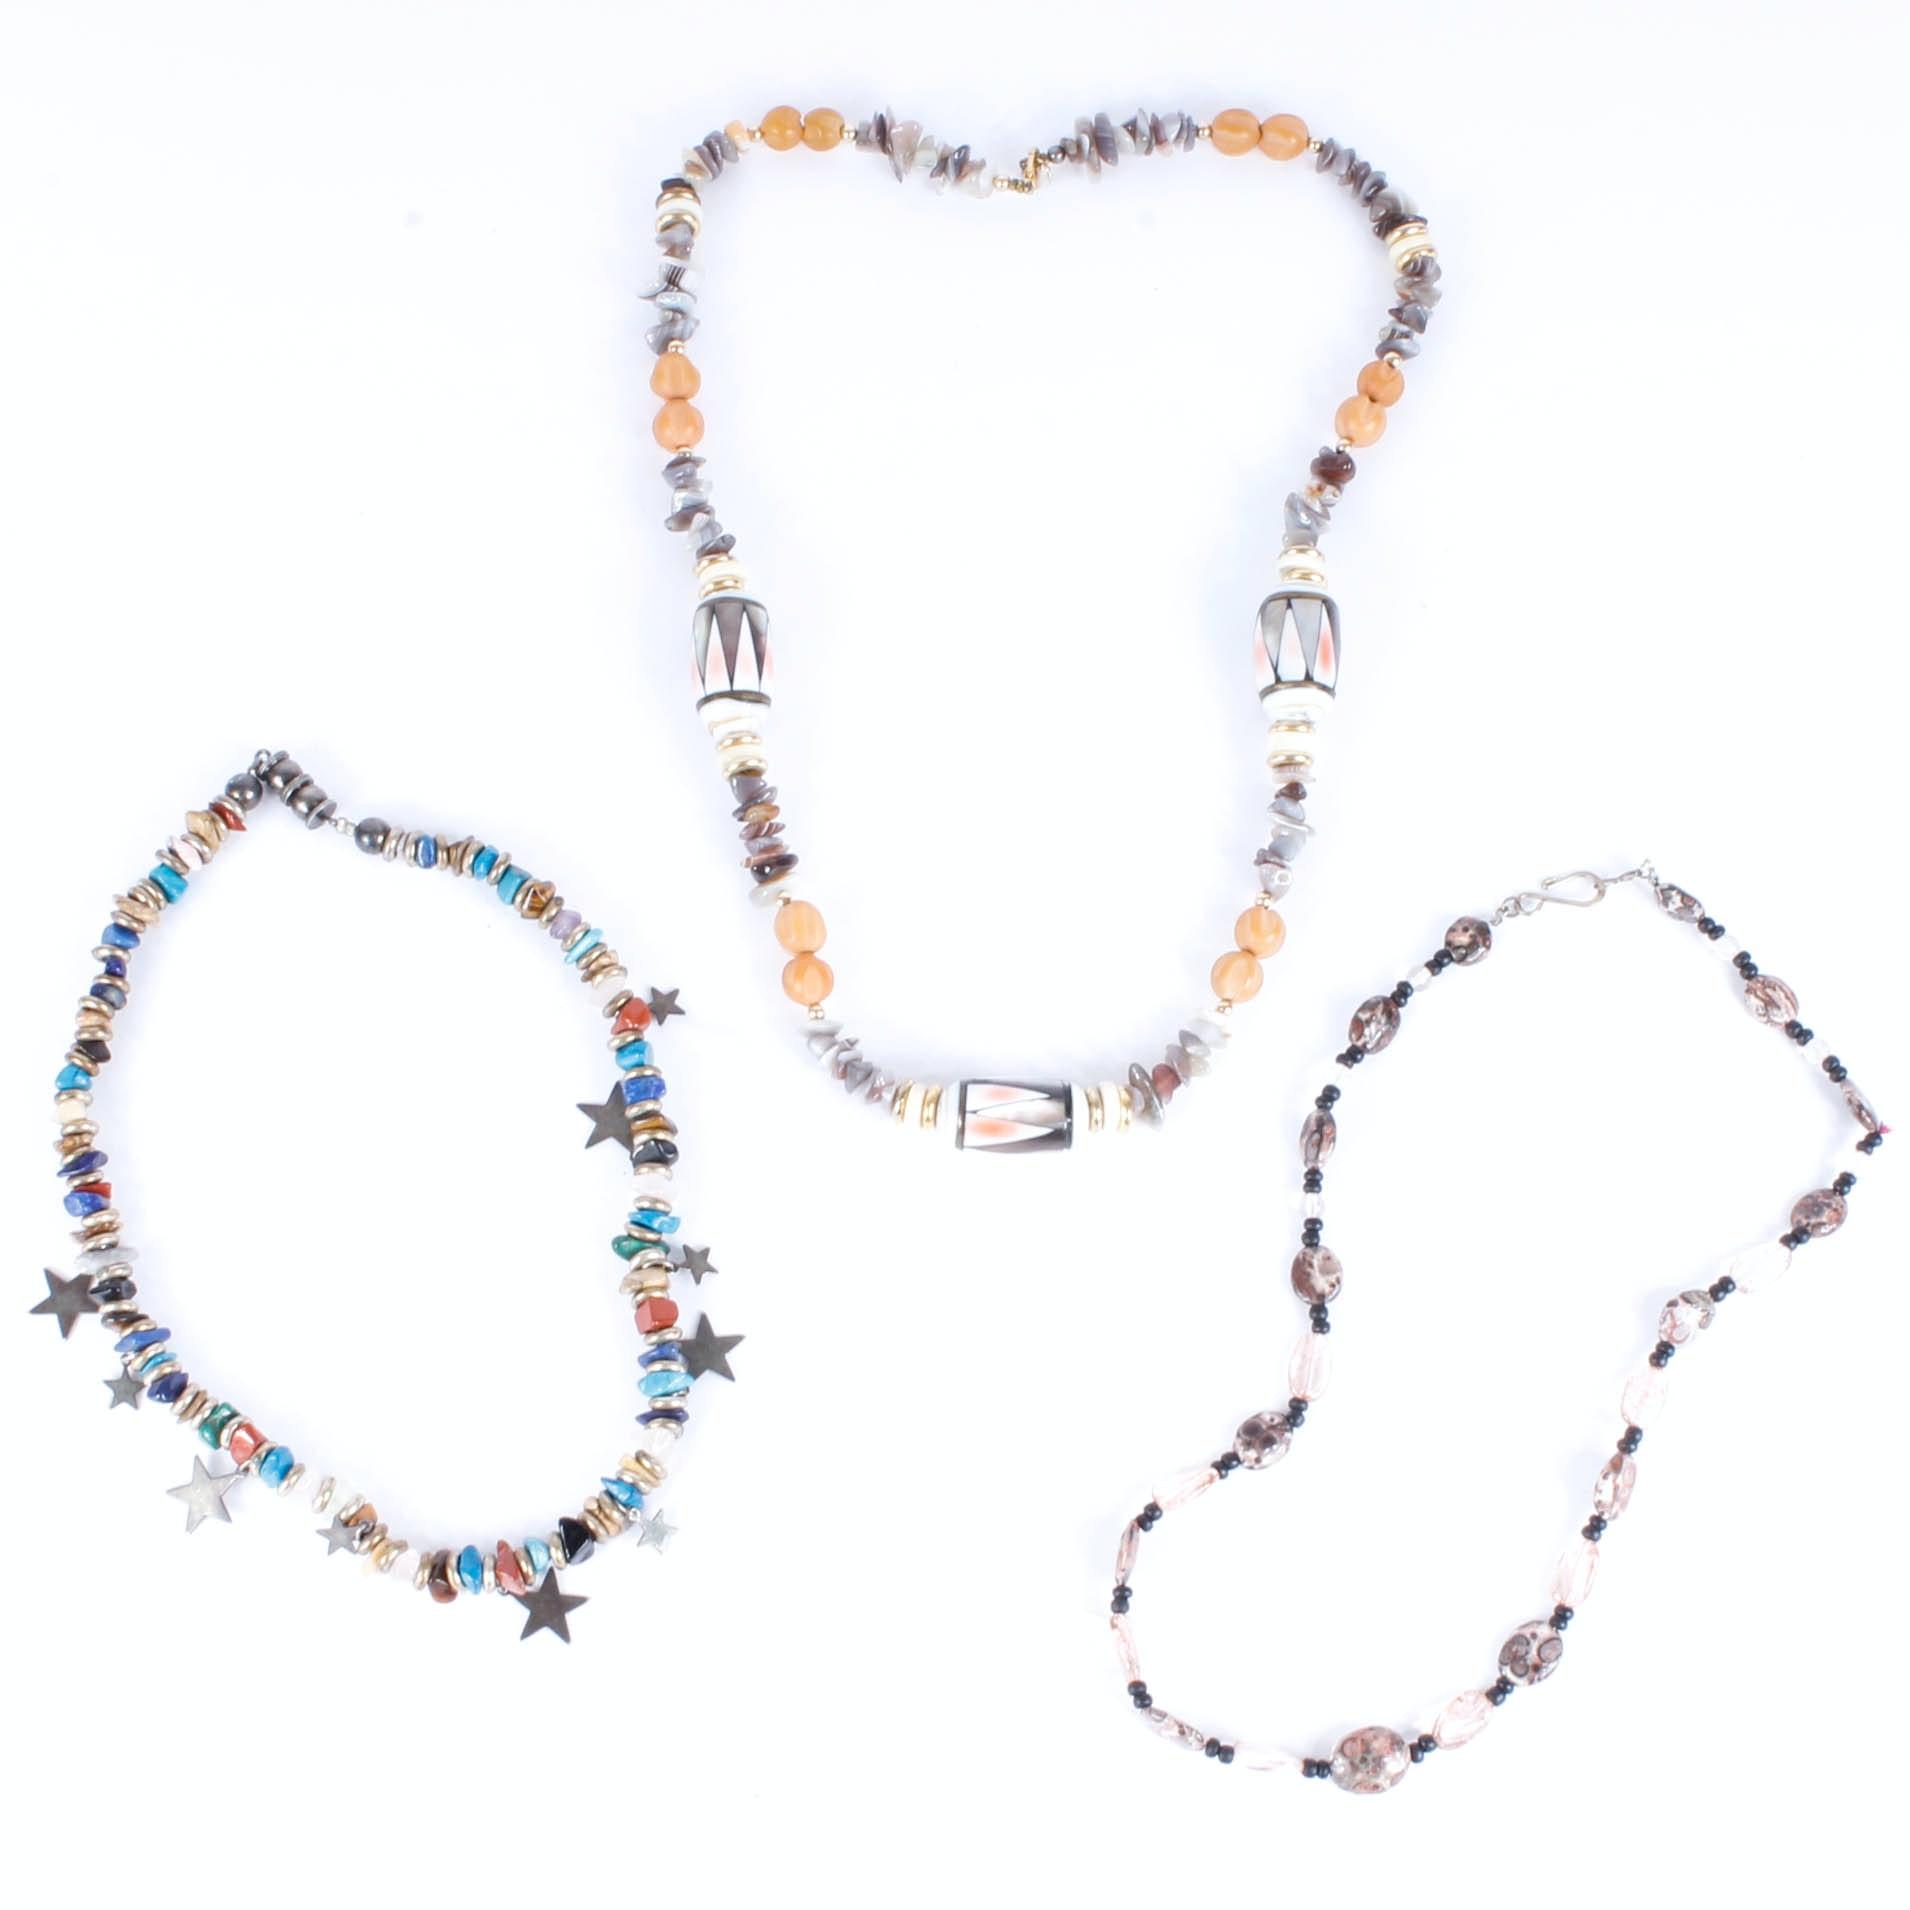 Semi-Precious Stone Bead Necklaces